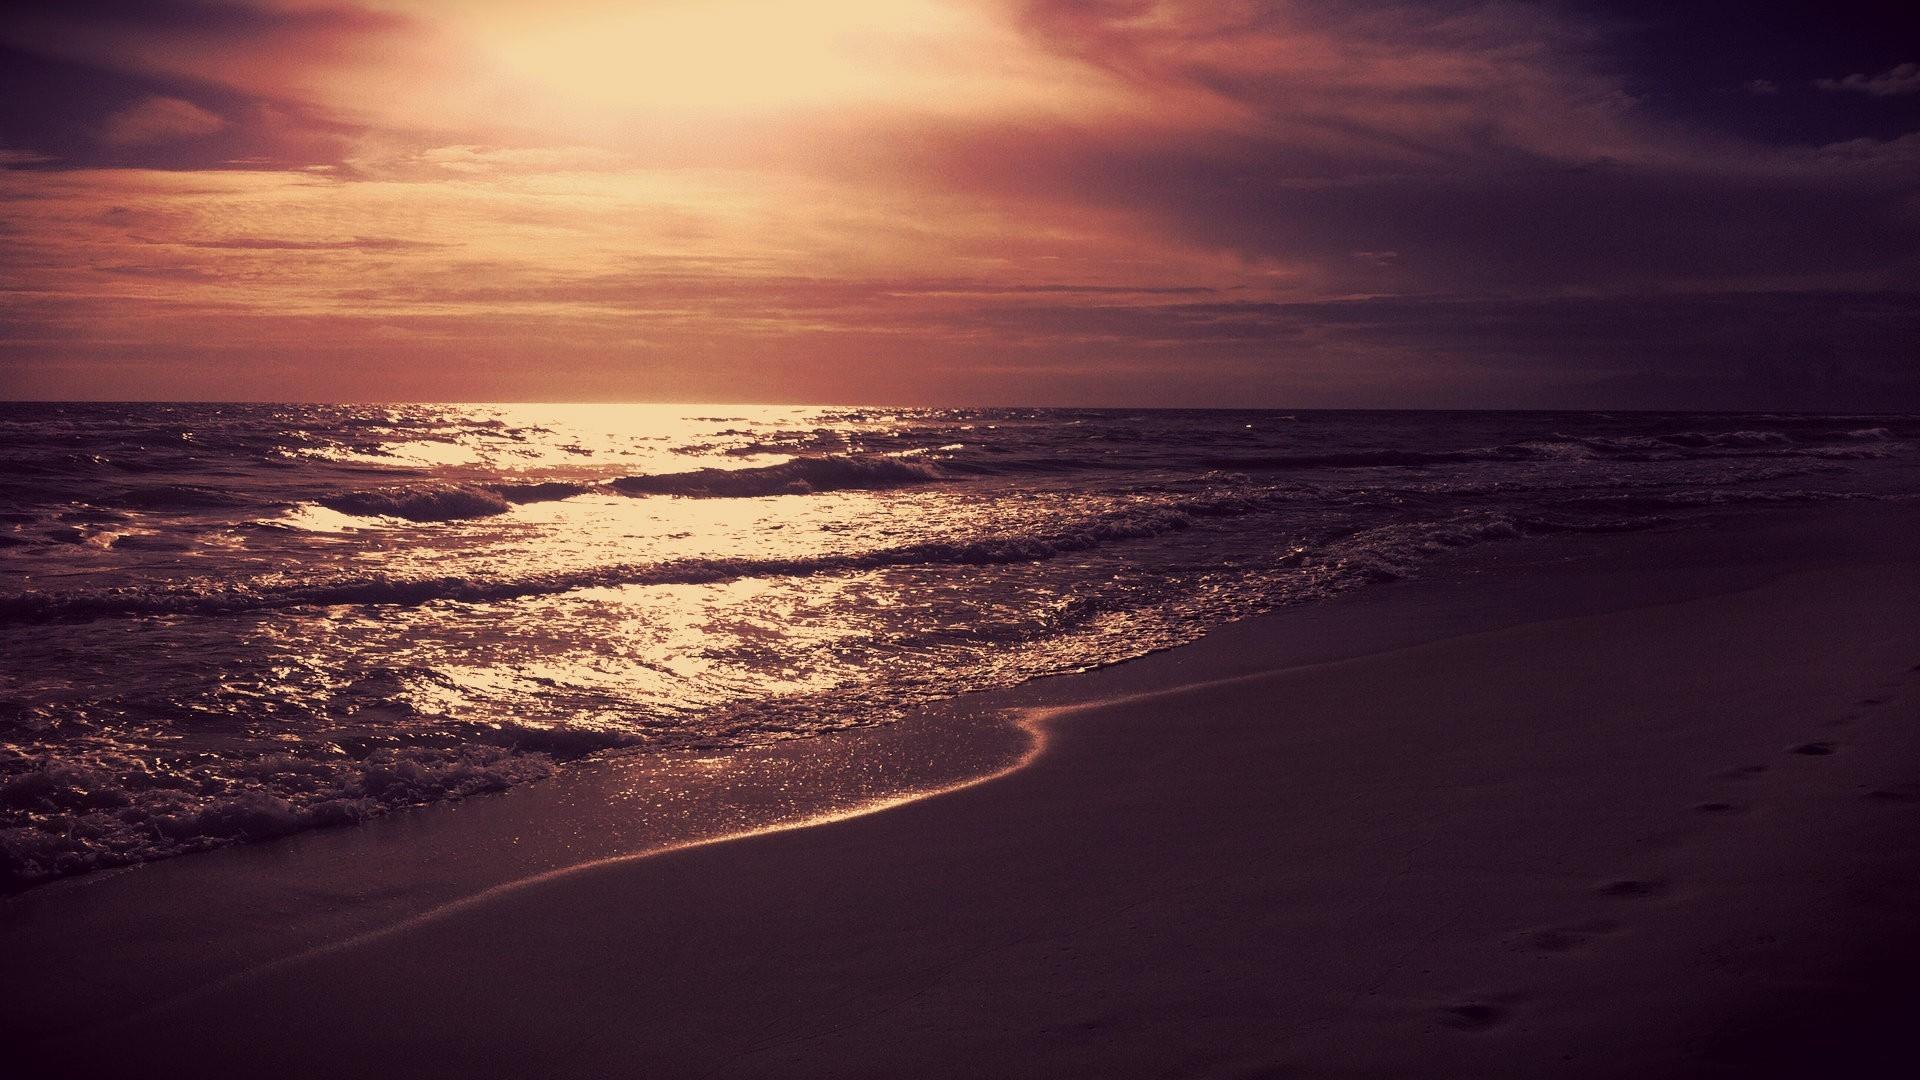 download wallpaper 1920x1080 sea night sunset light